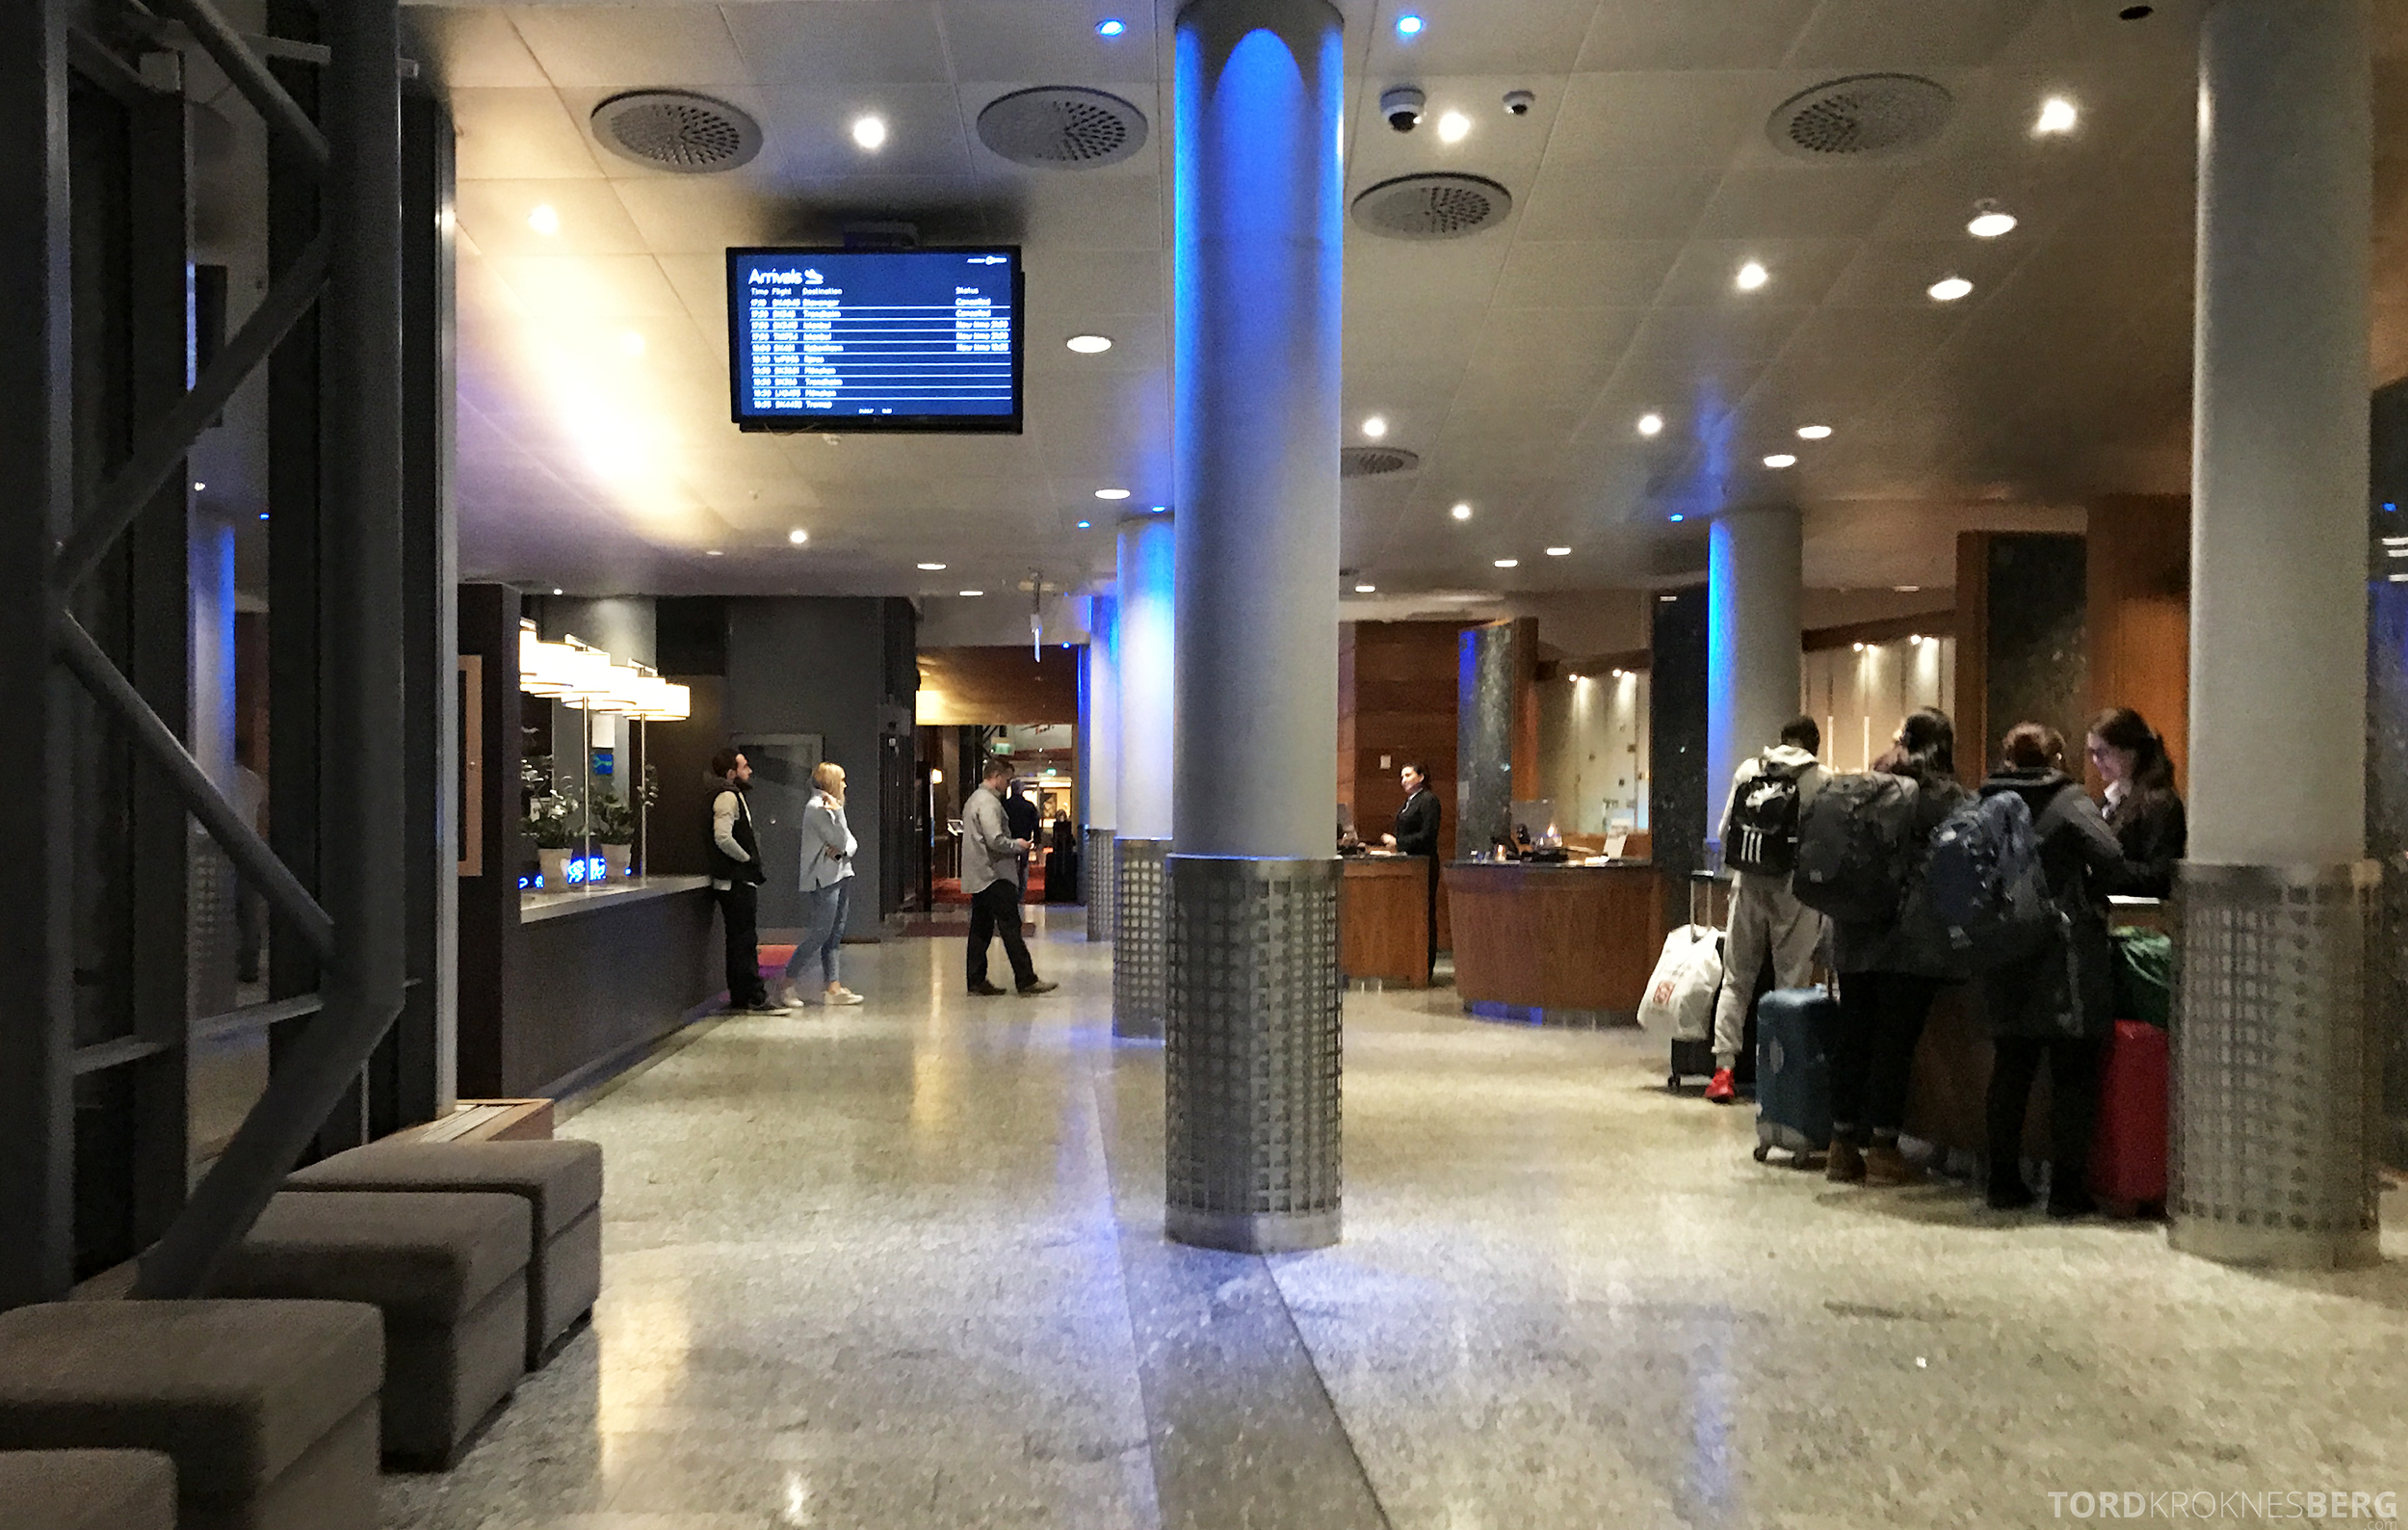 Radisson Blu Oslo Airport Hotel Suite innsjekk